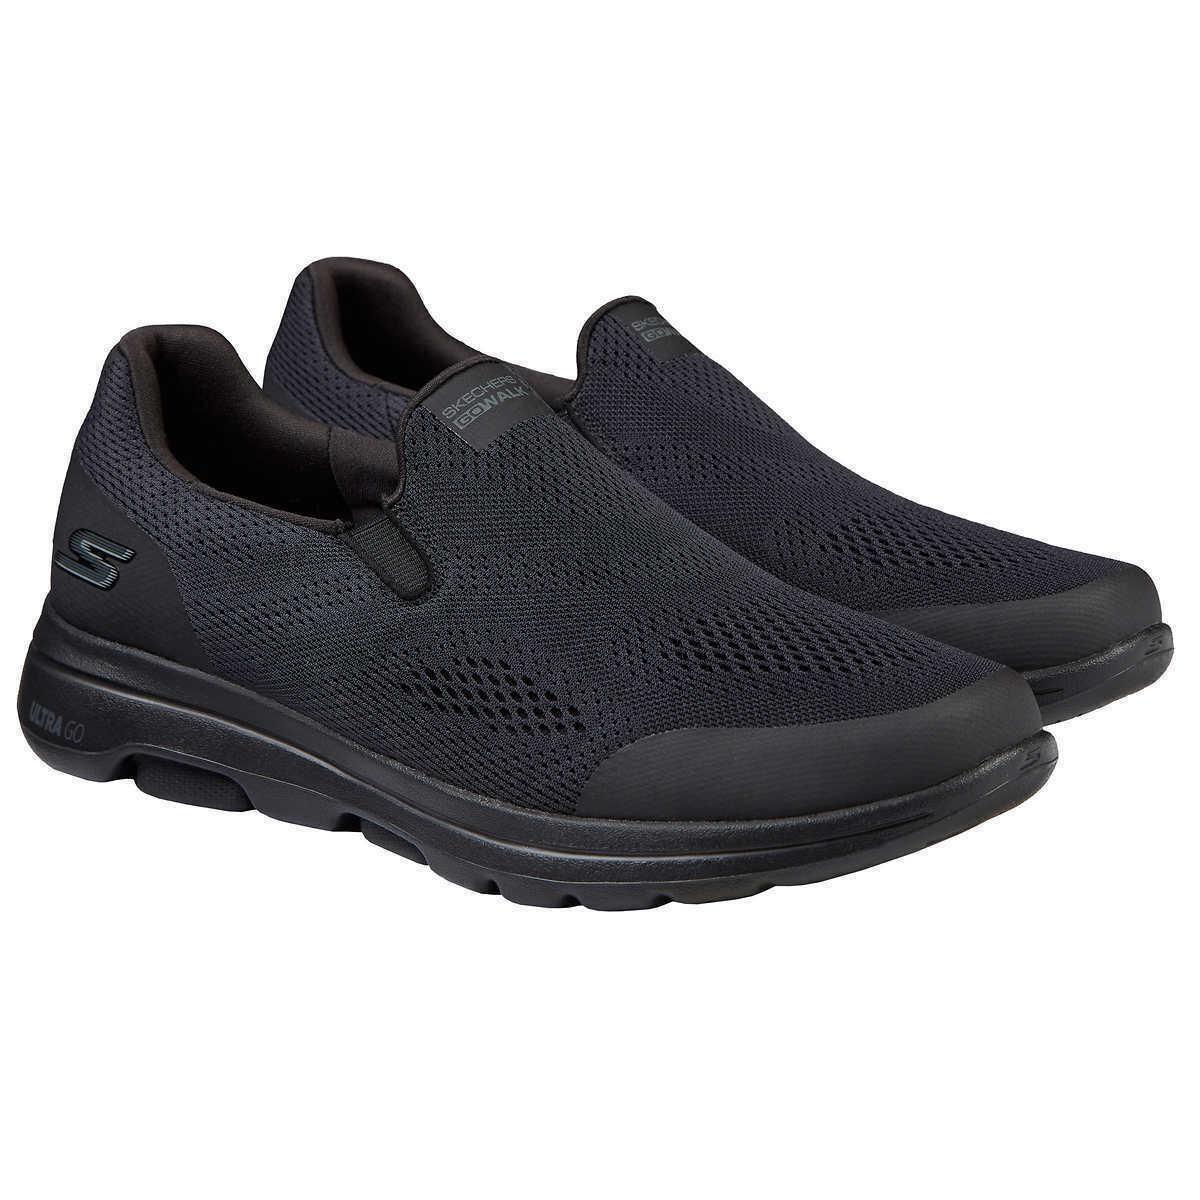 skechers air cool memory foam shoes